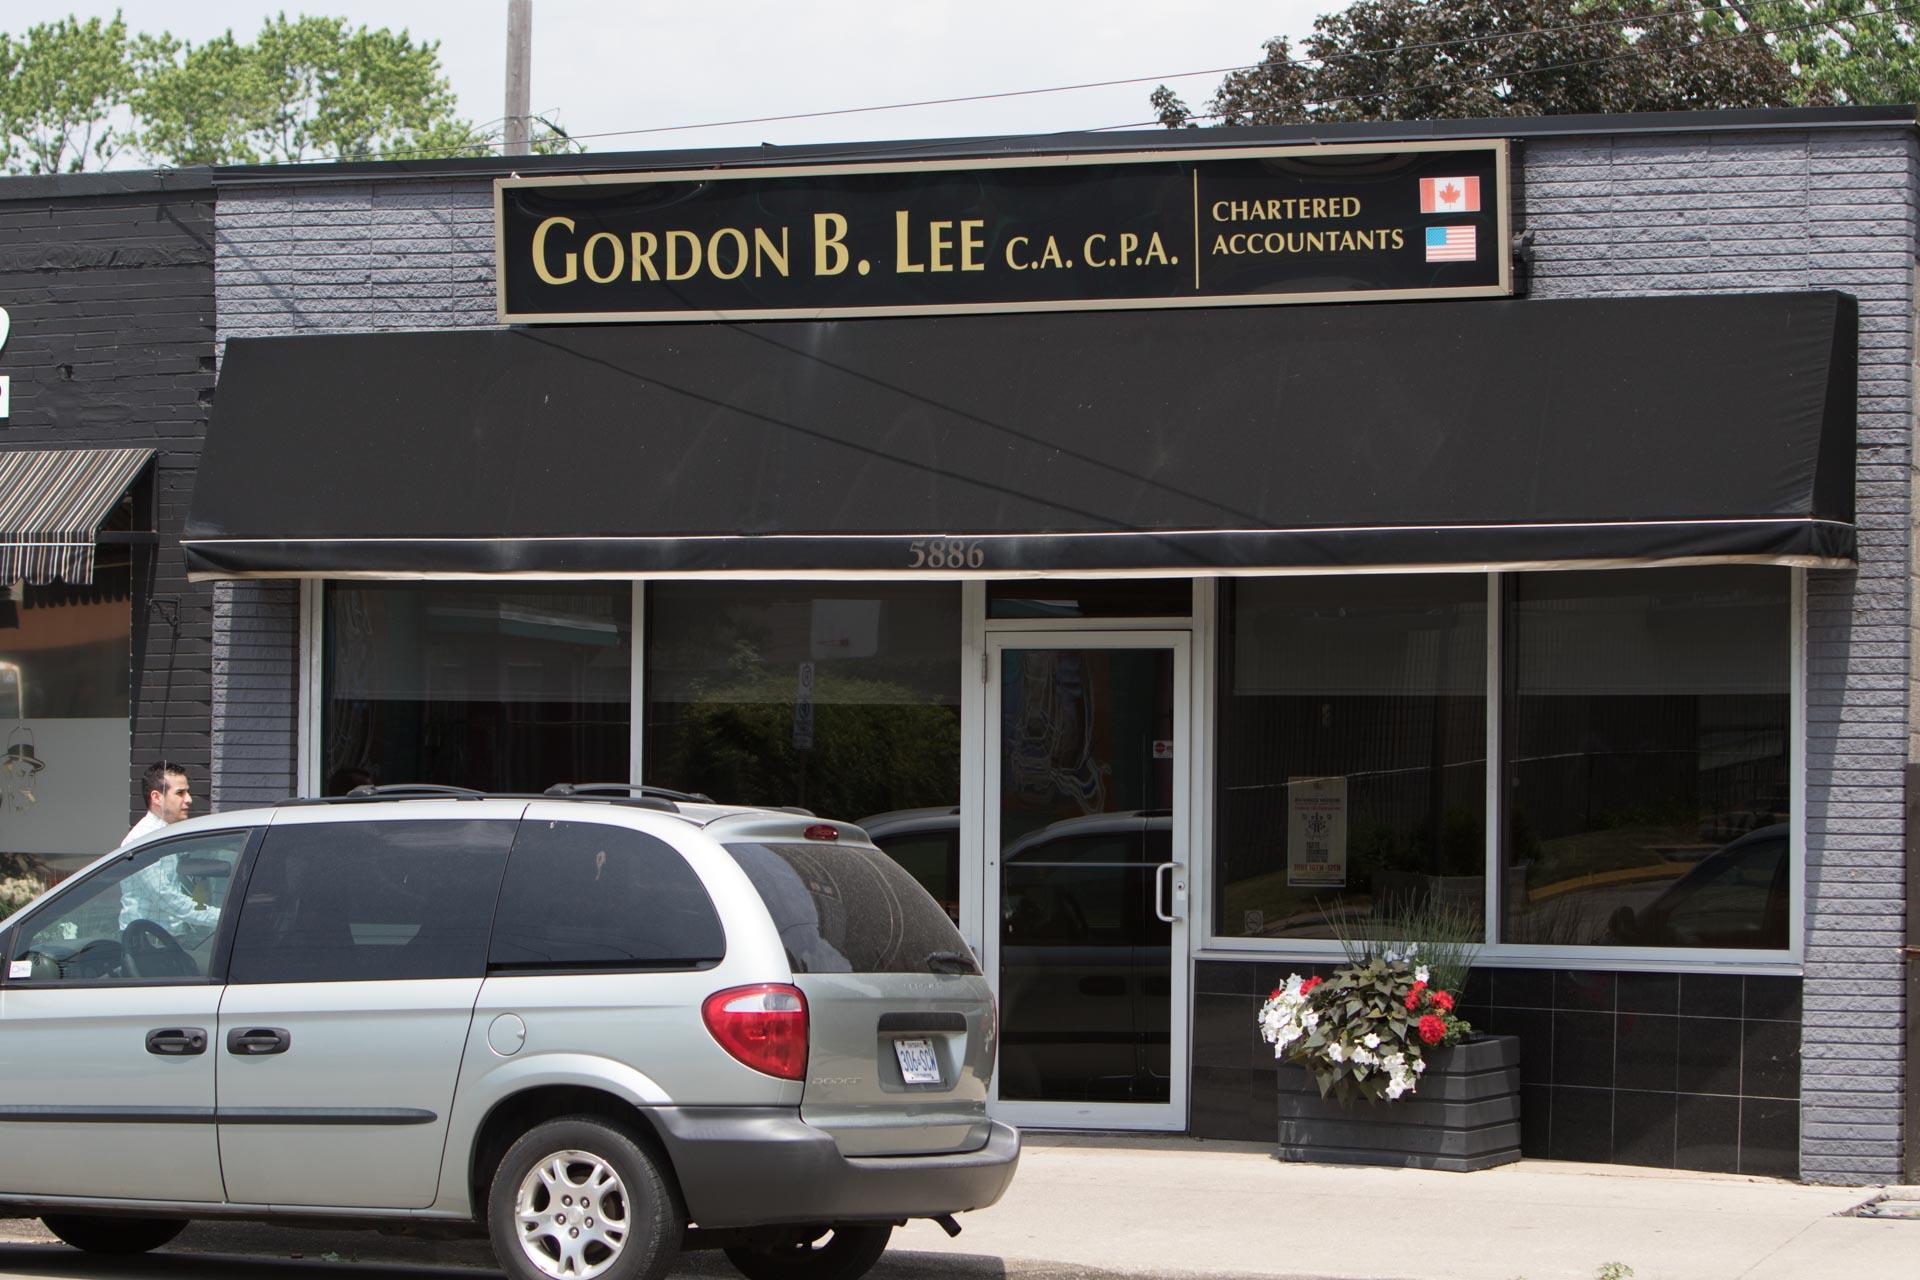 Gordon B. Lee C.A C.P.A Chartered Accountants